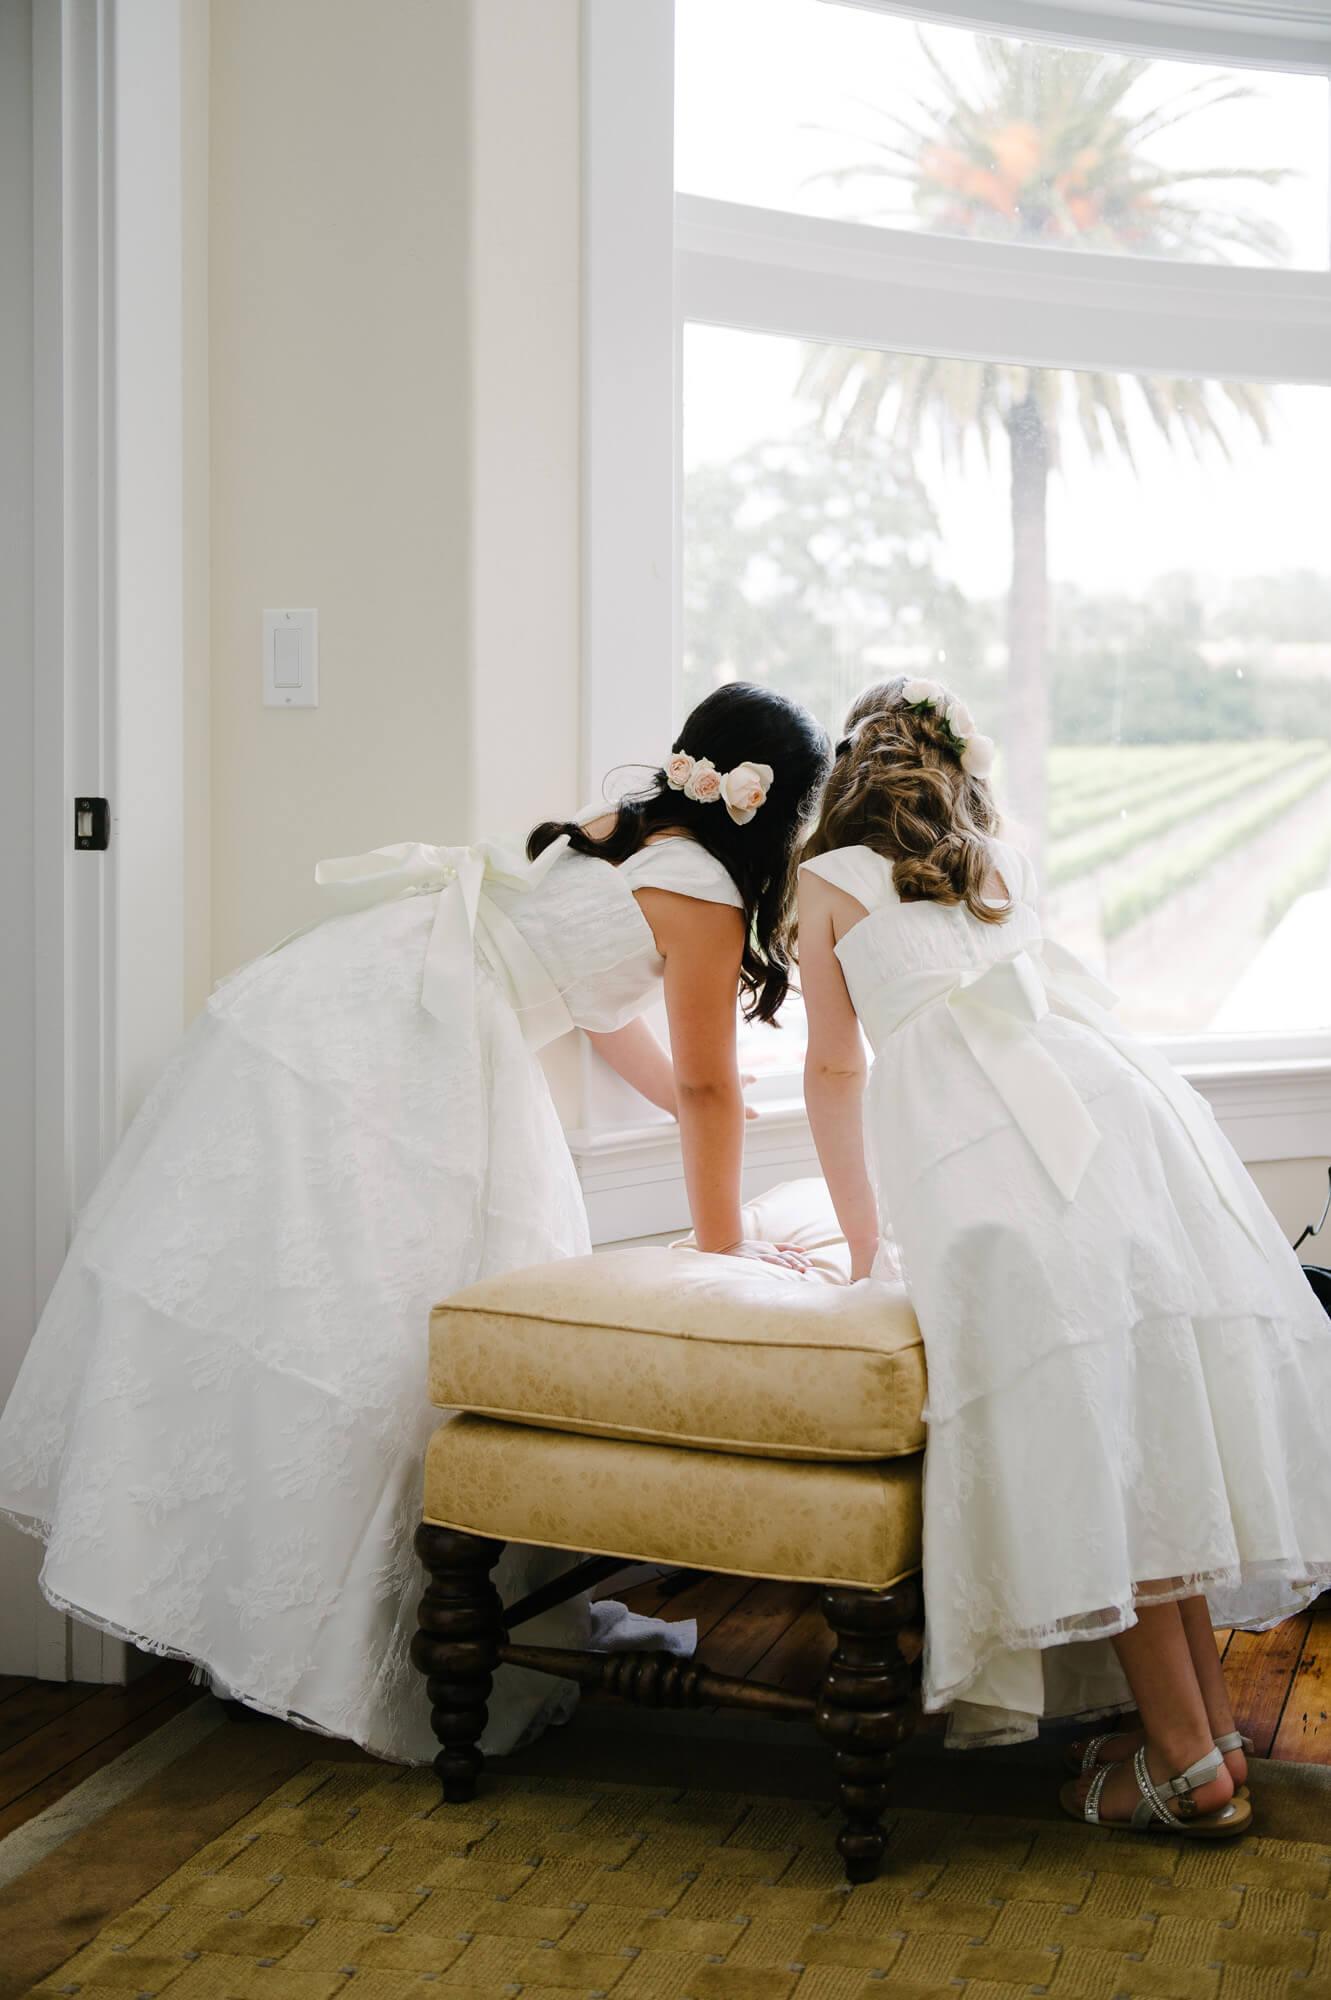 los-olivos-firestone-winery-destination-wedding-central-coast-wedding-photographer-04.jpg